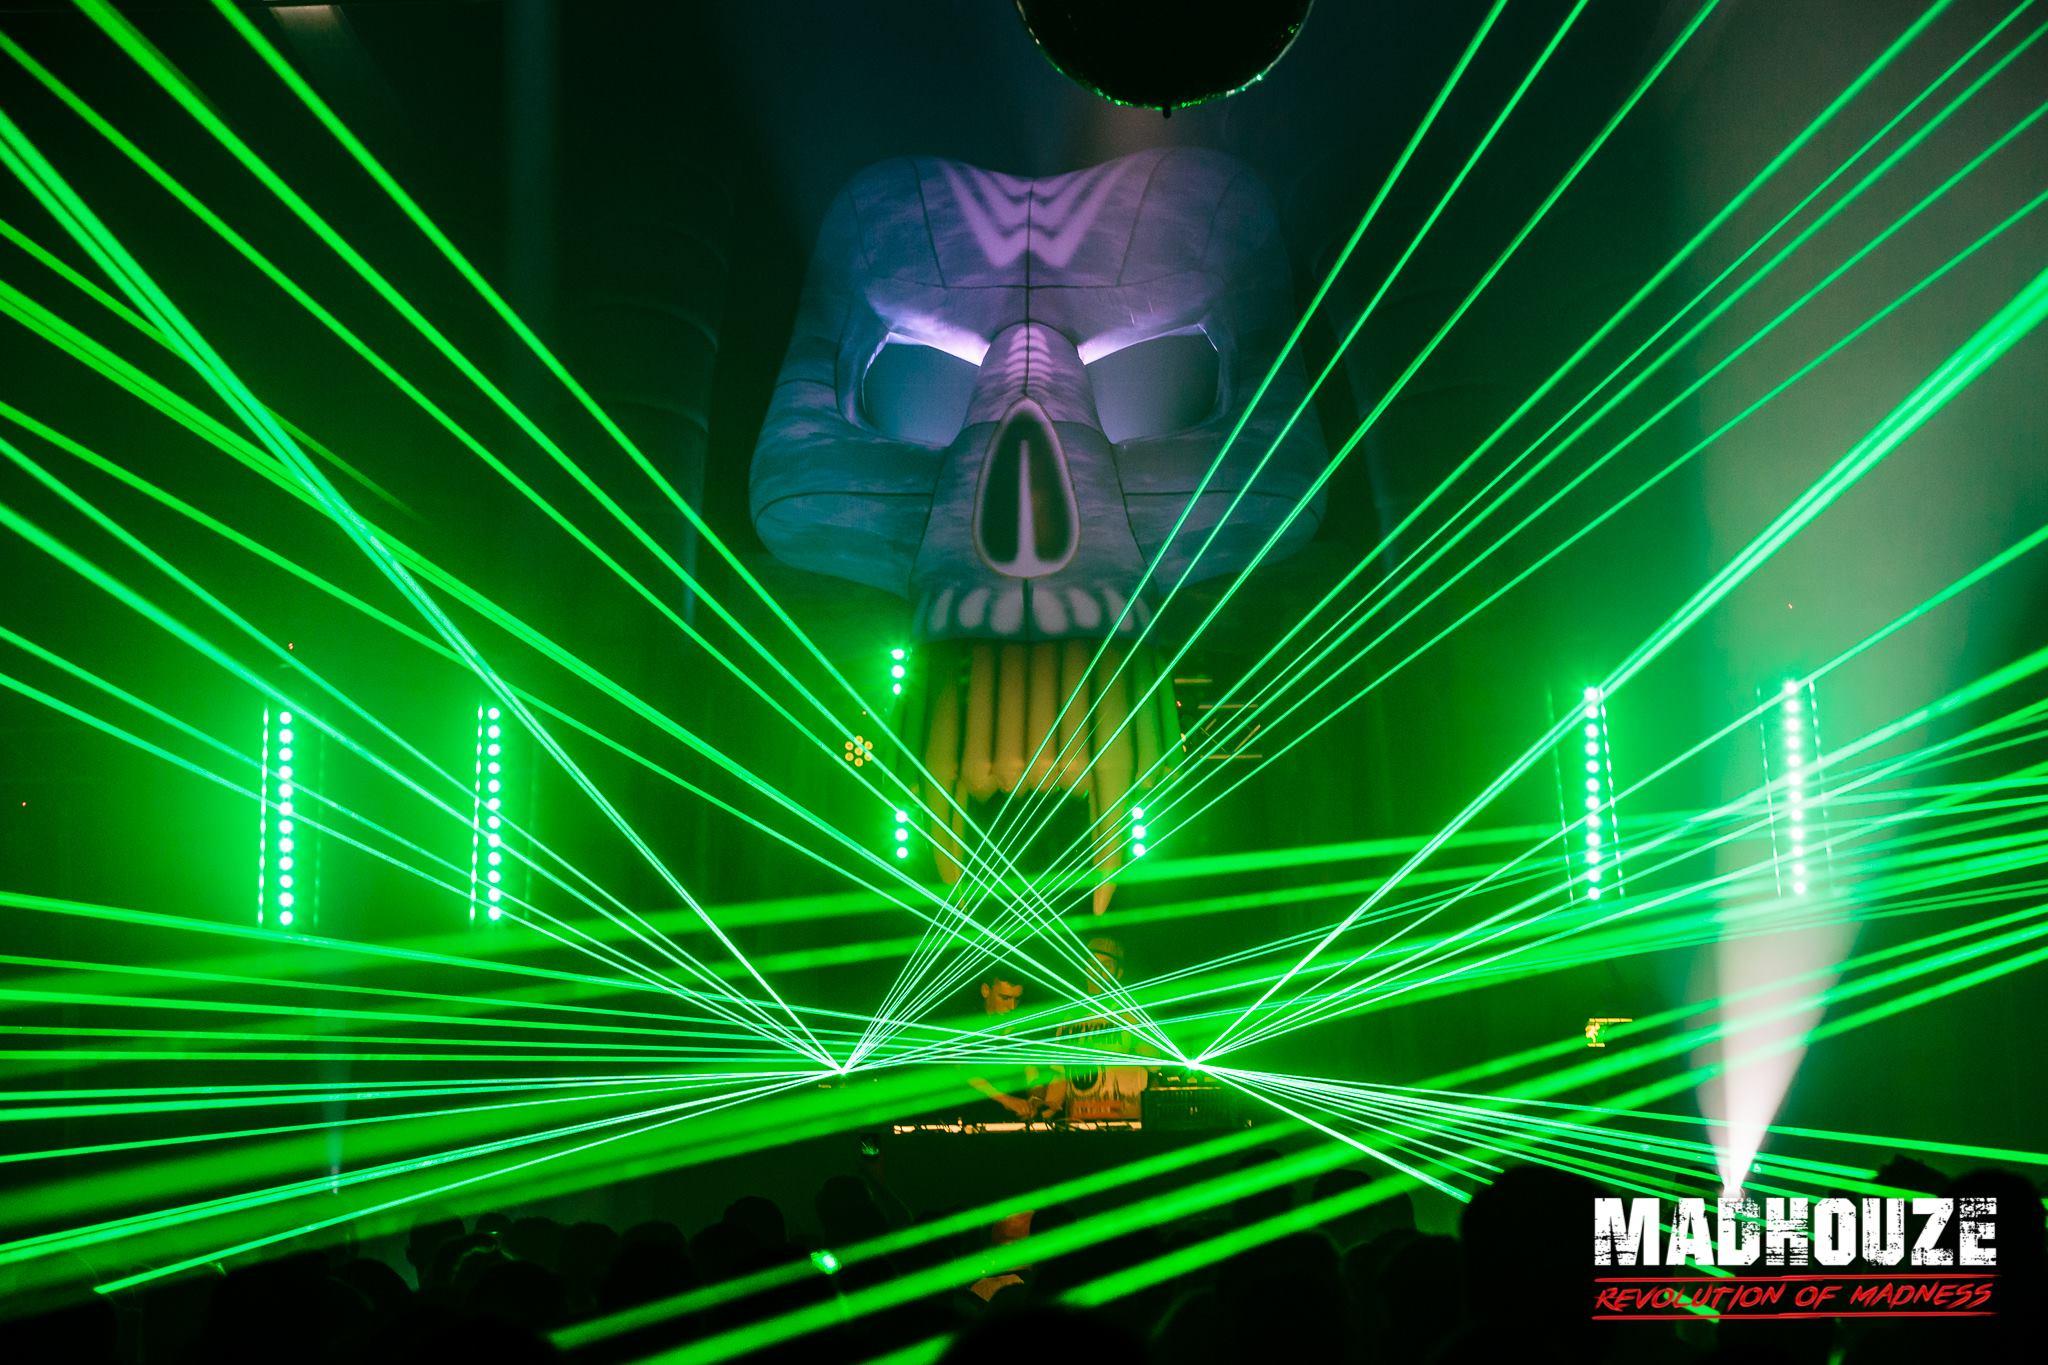 Skull tijdens Madhouze Events Revolution of Madness